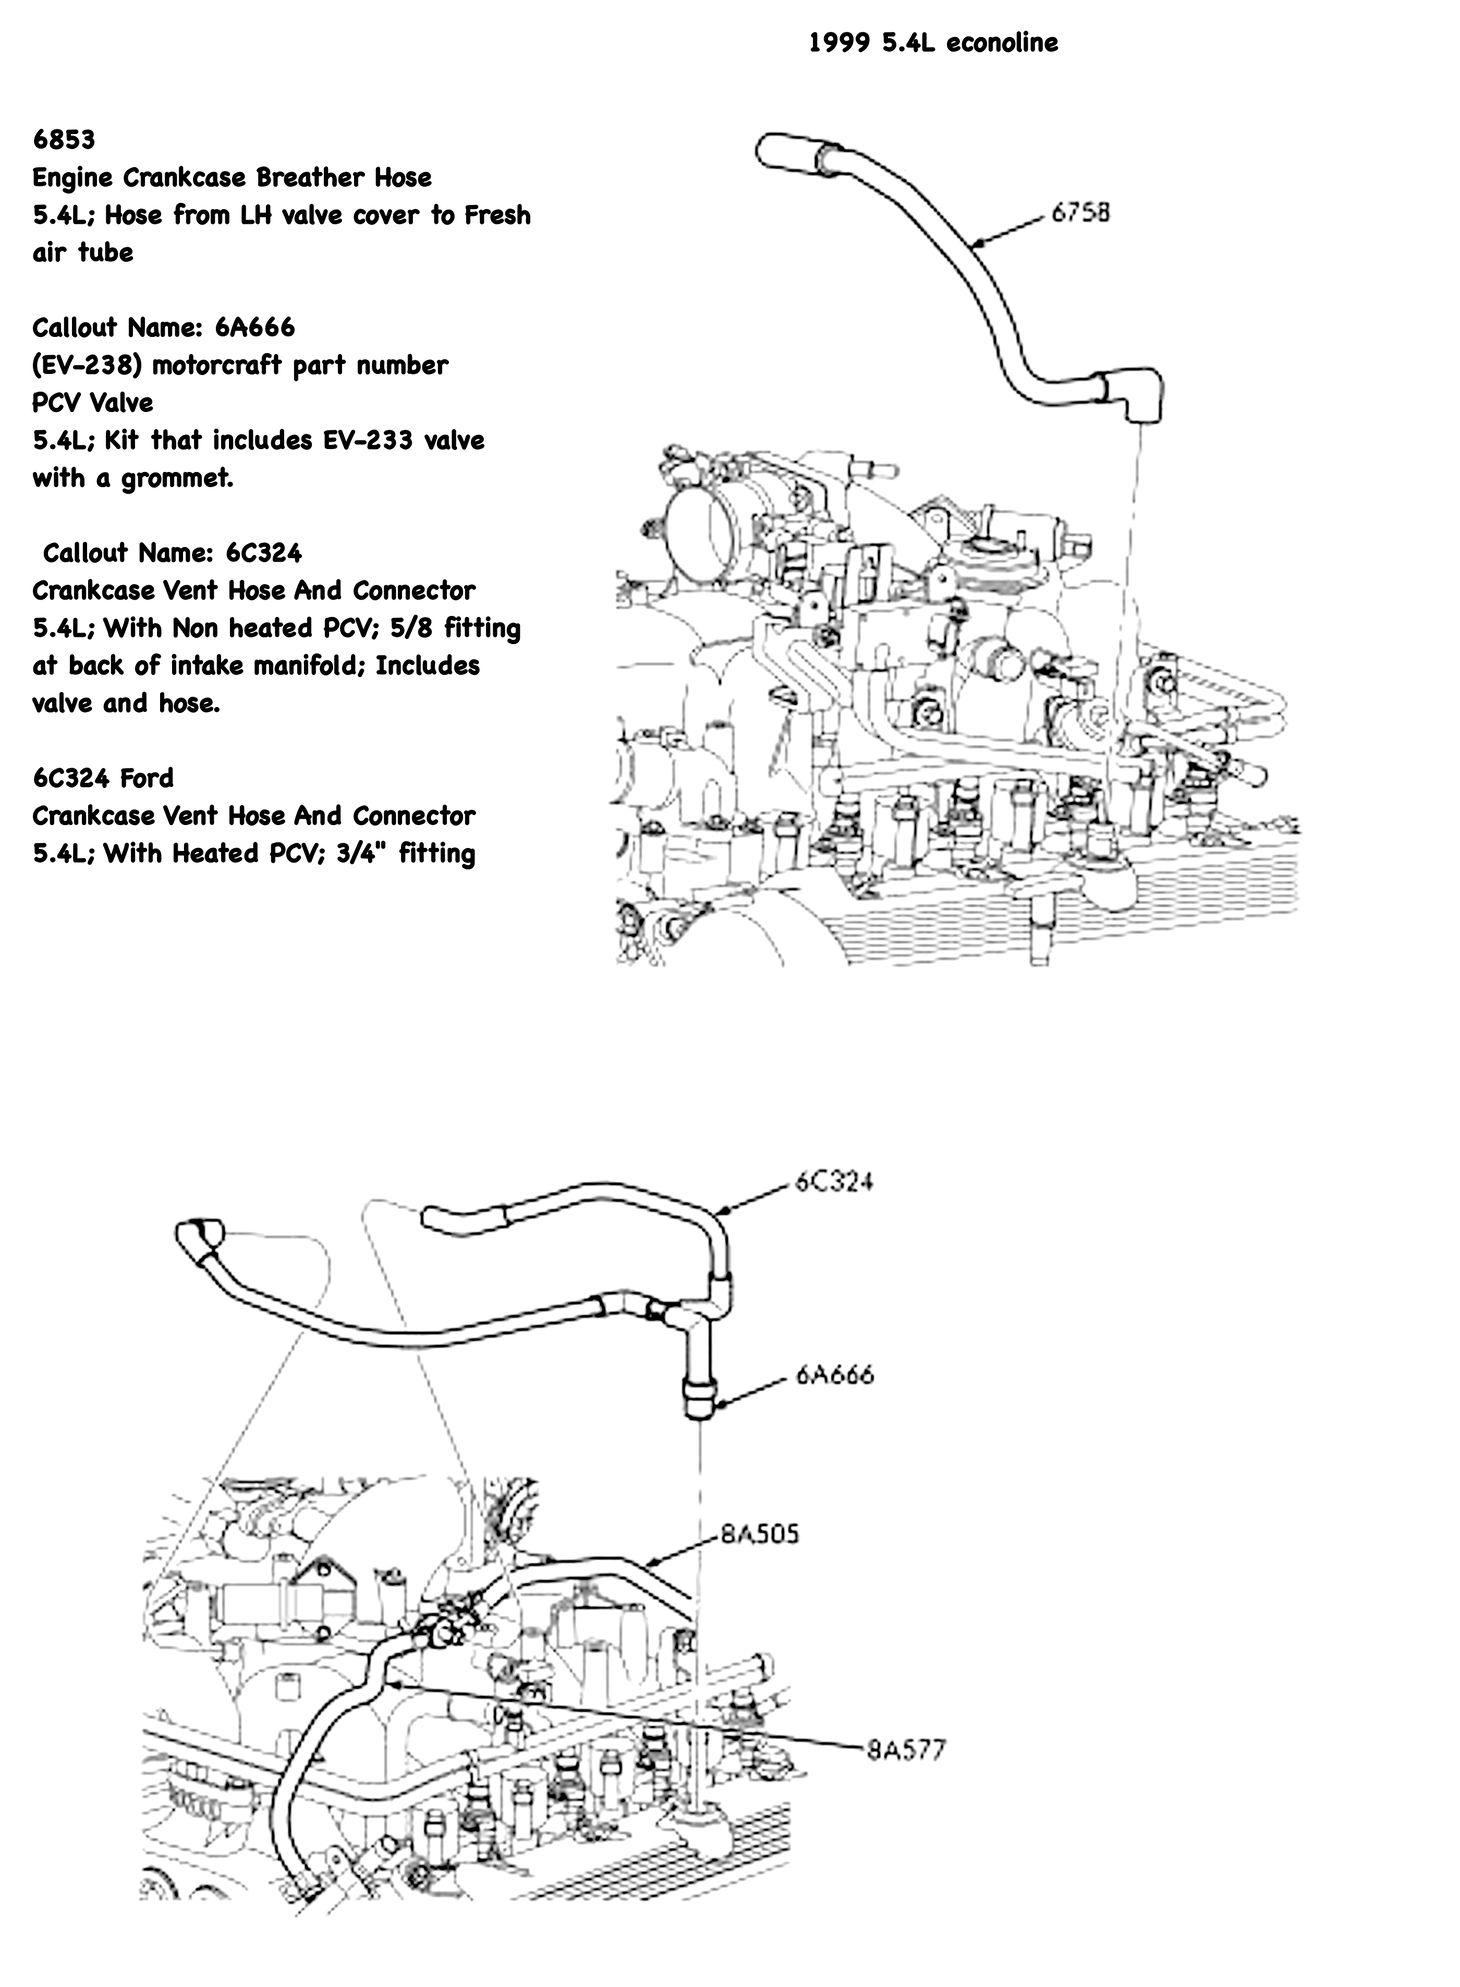 2001 ford f 150 dpfe sensor location